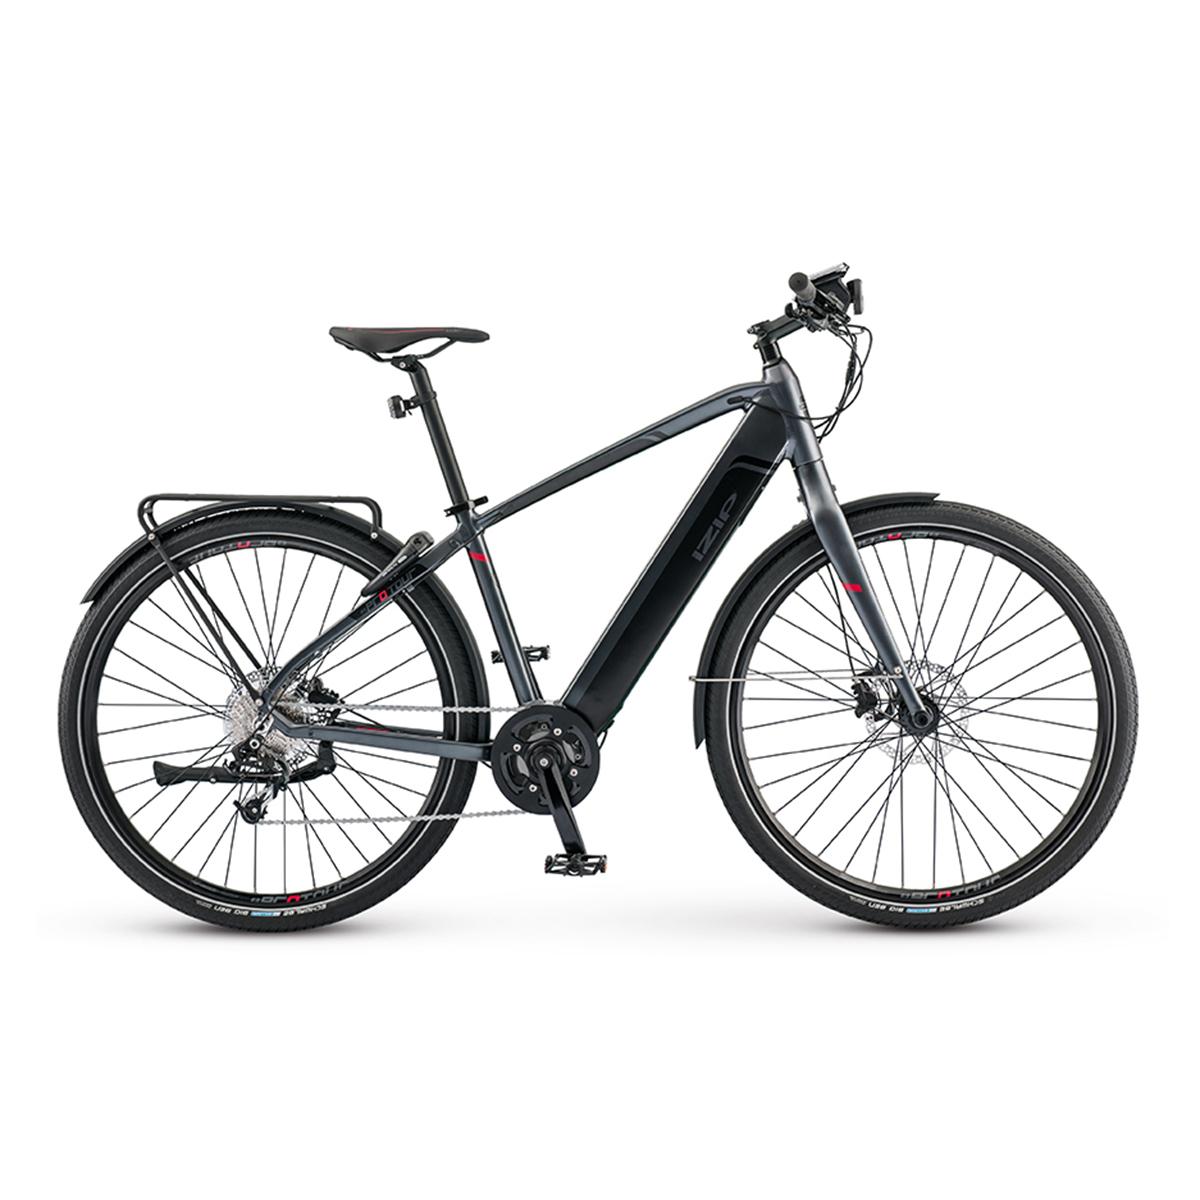 Izip E3 Protour Bike